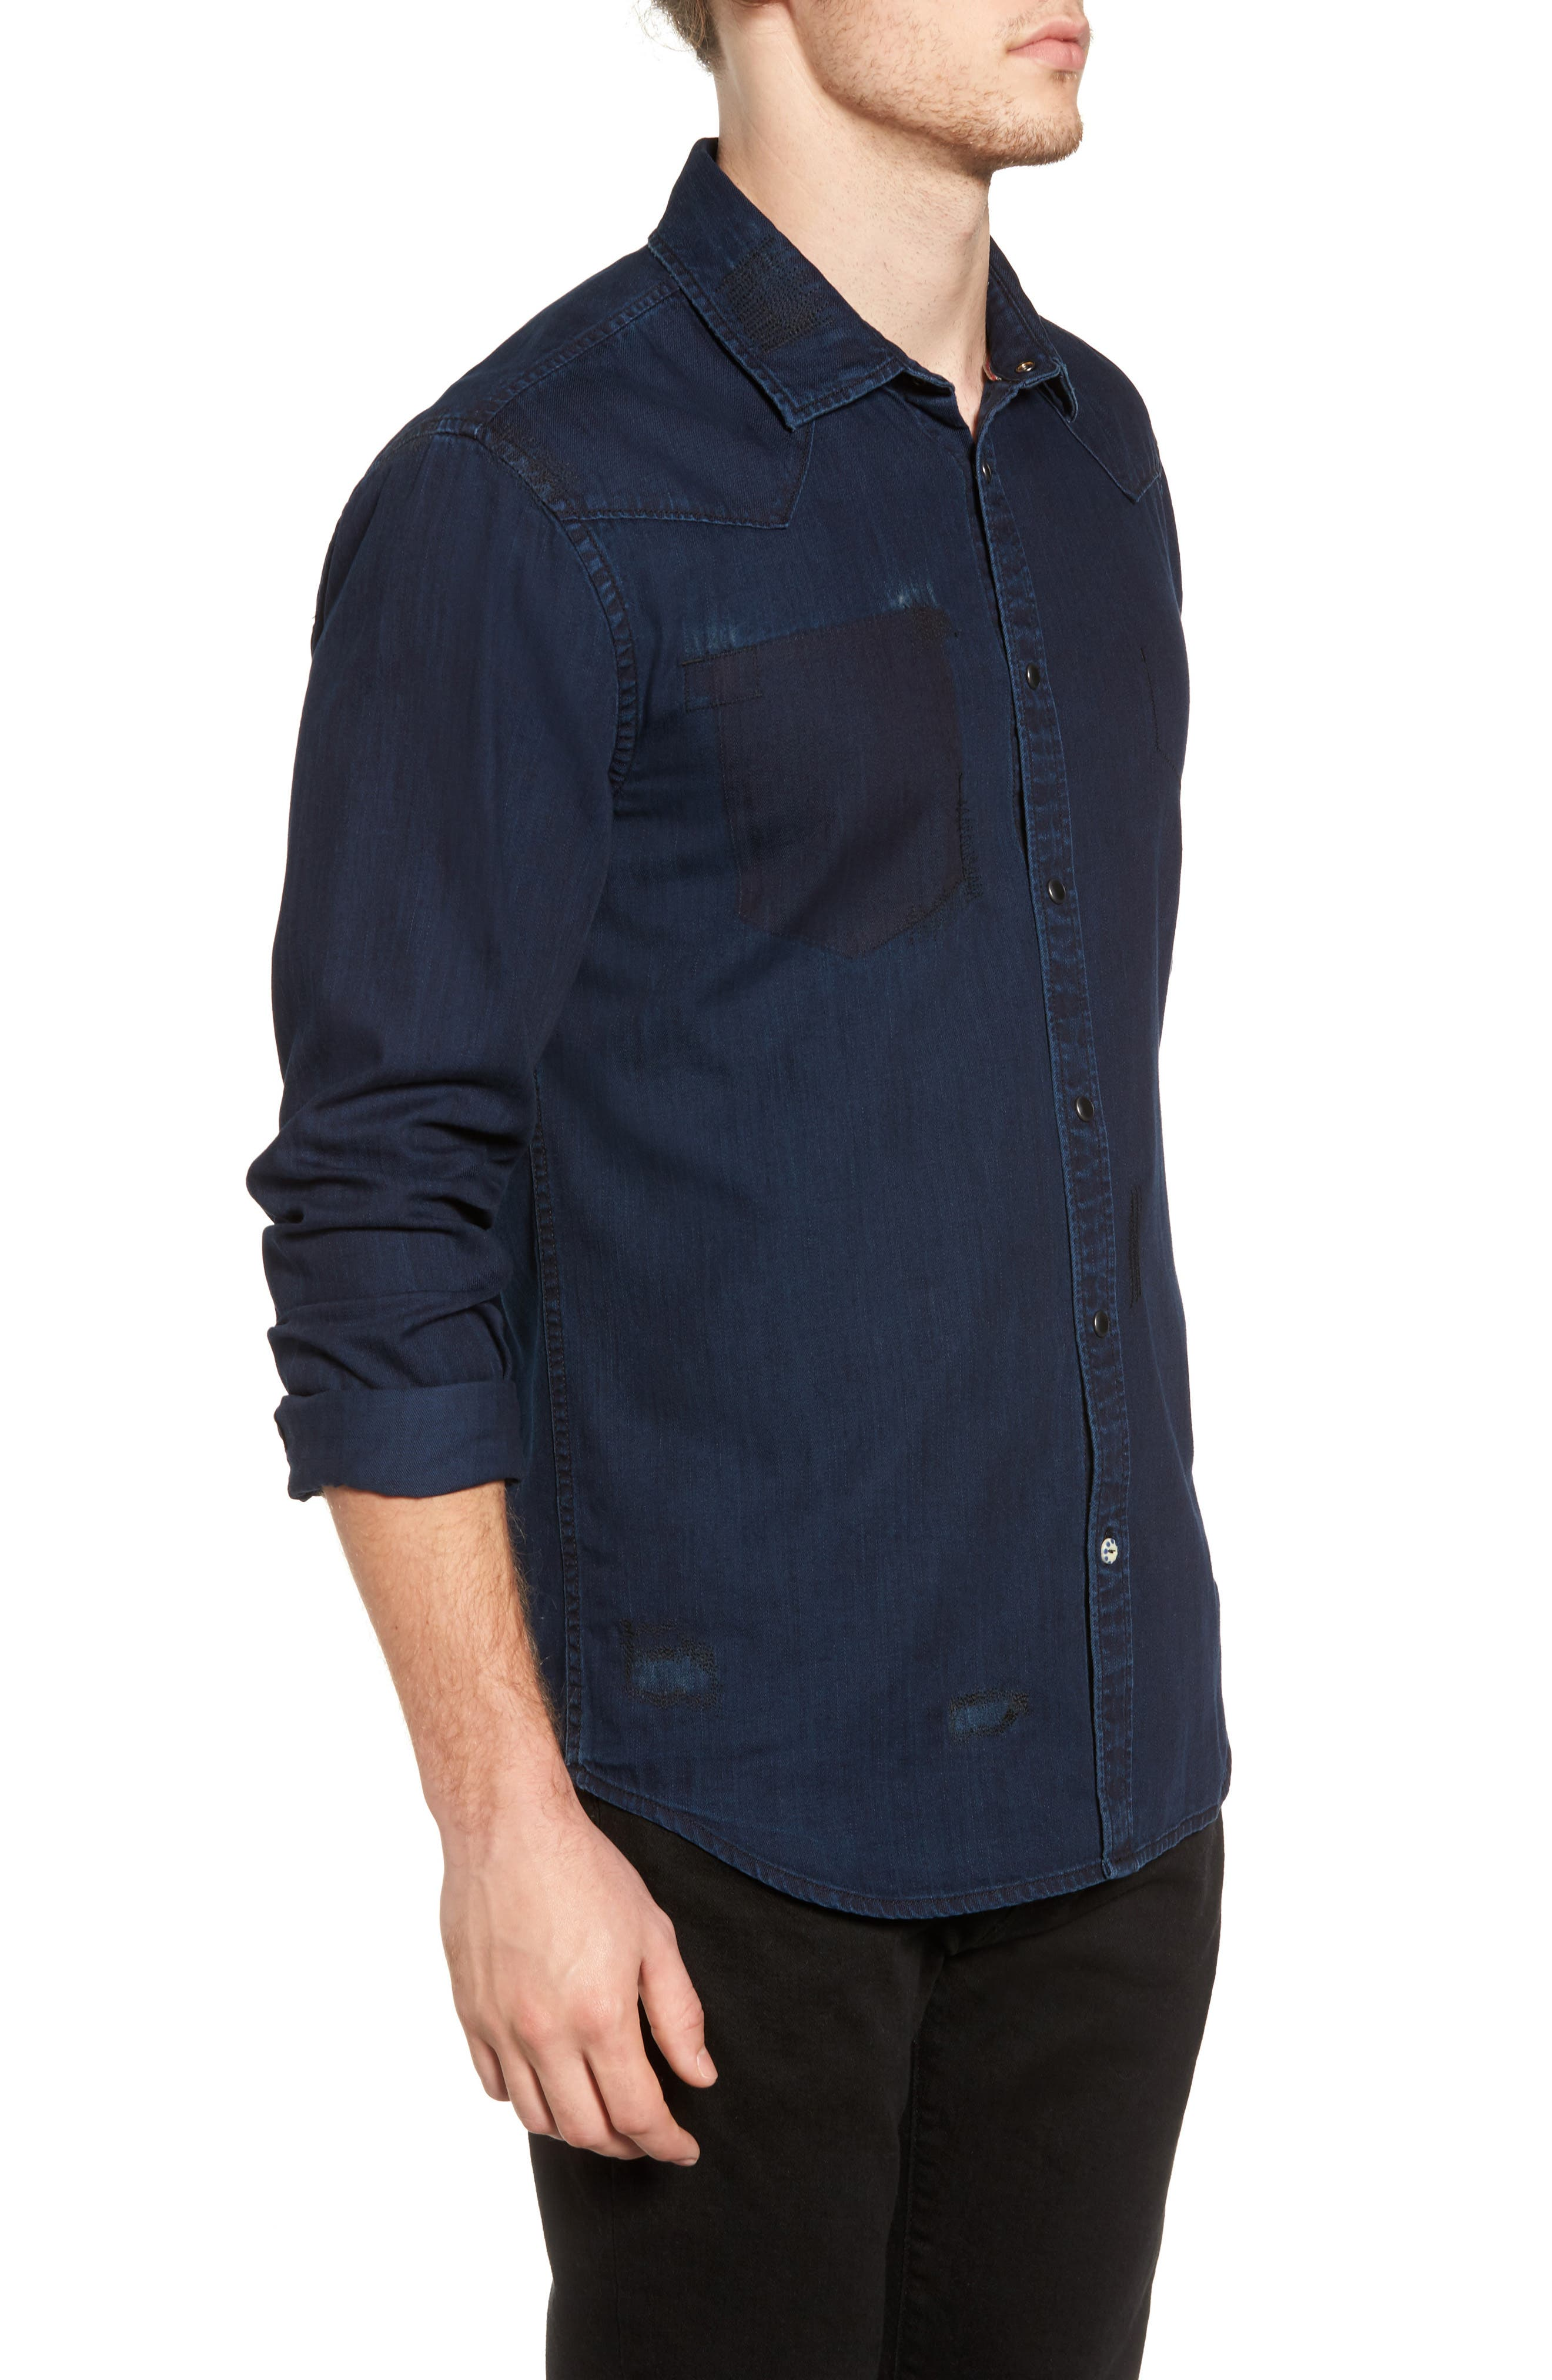 Pocketless Western Denim Shirt,                             Alternate thumbnail 3, color,                             Midnight